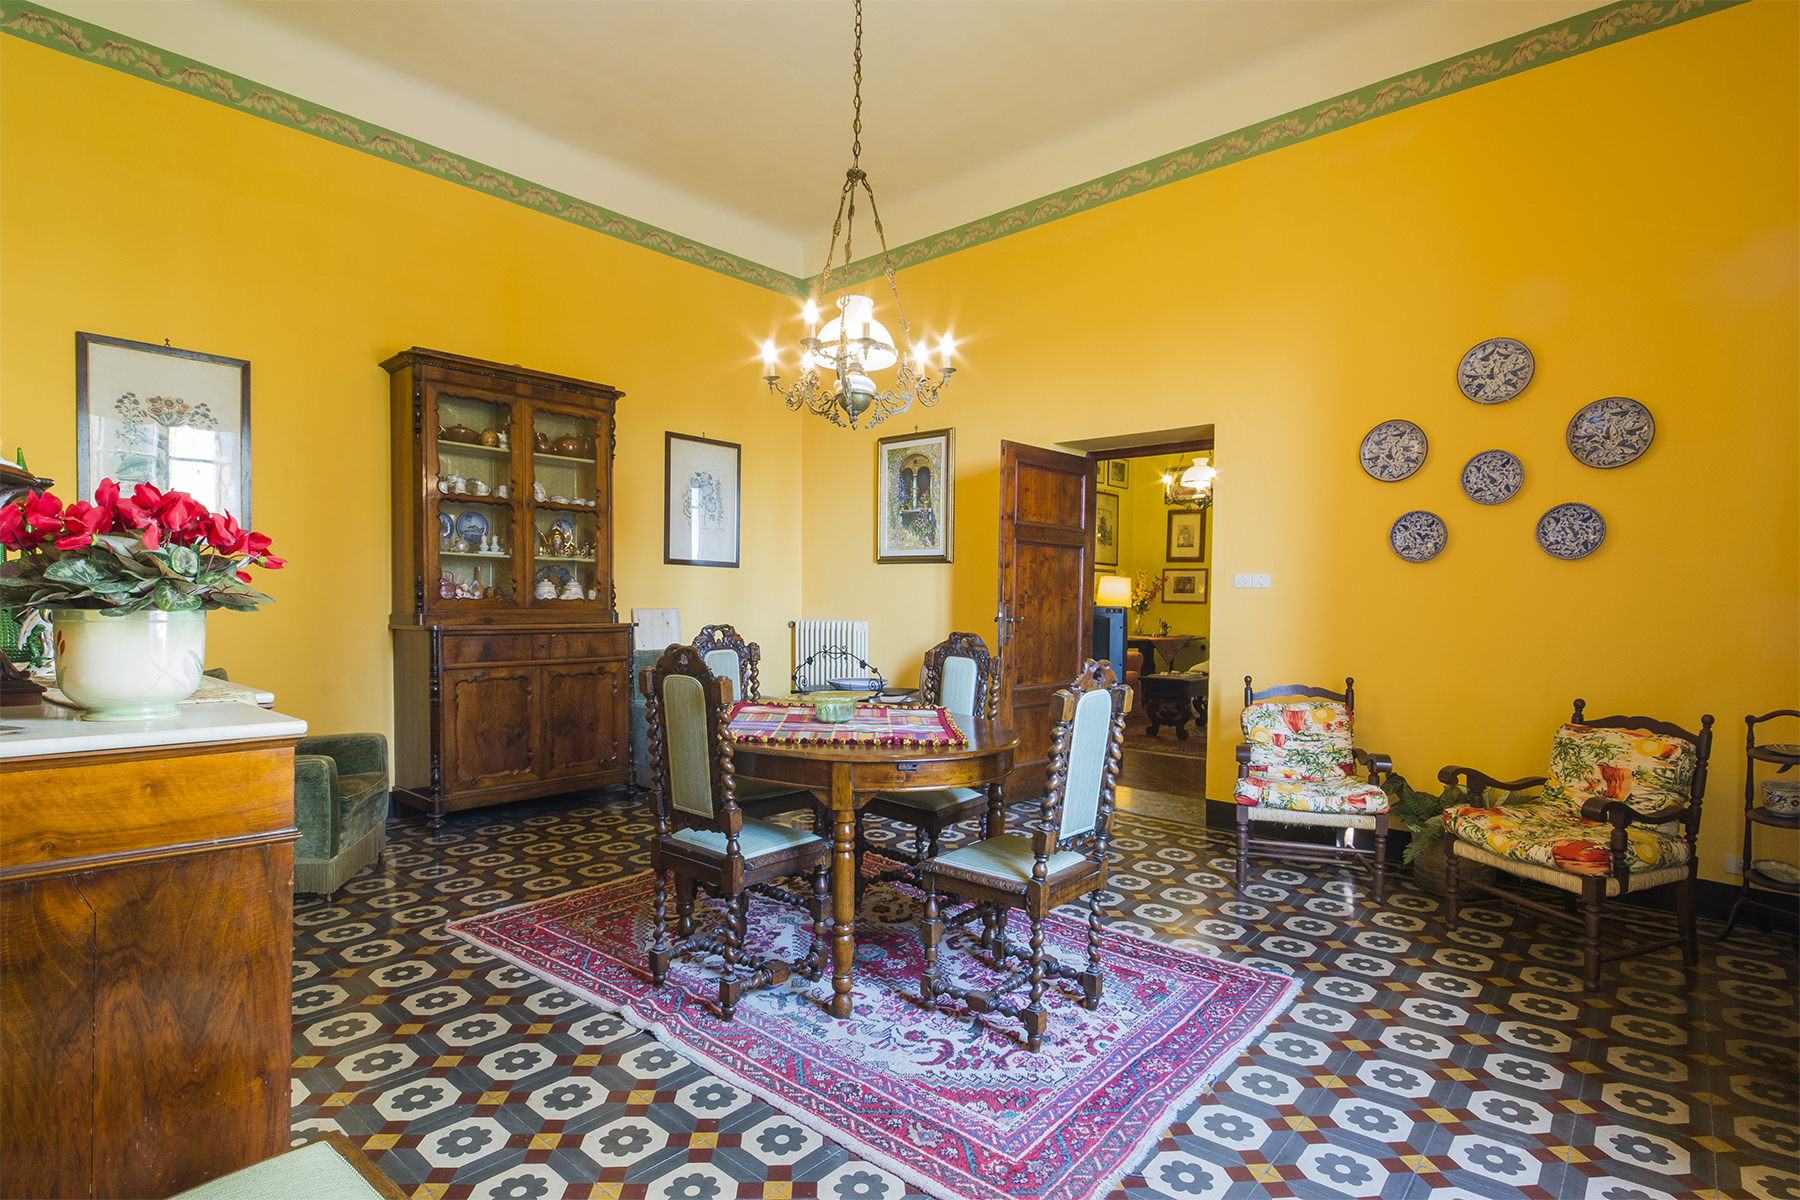 Villa in Vendita a Lucca: 5 locali, 1210 mq - Foto 7